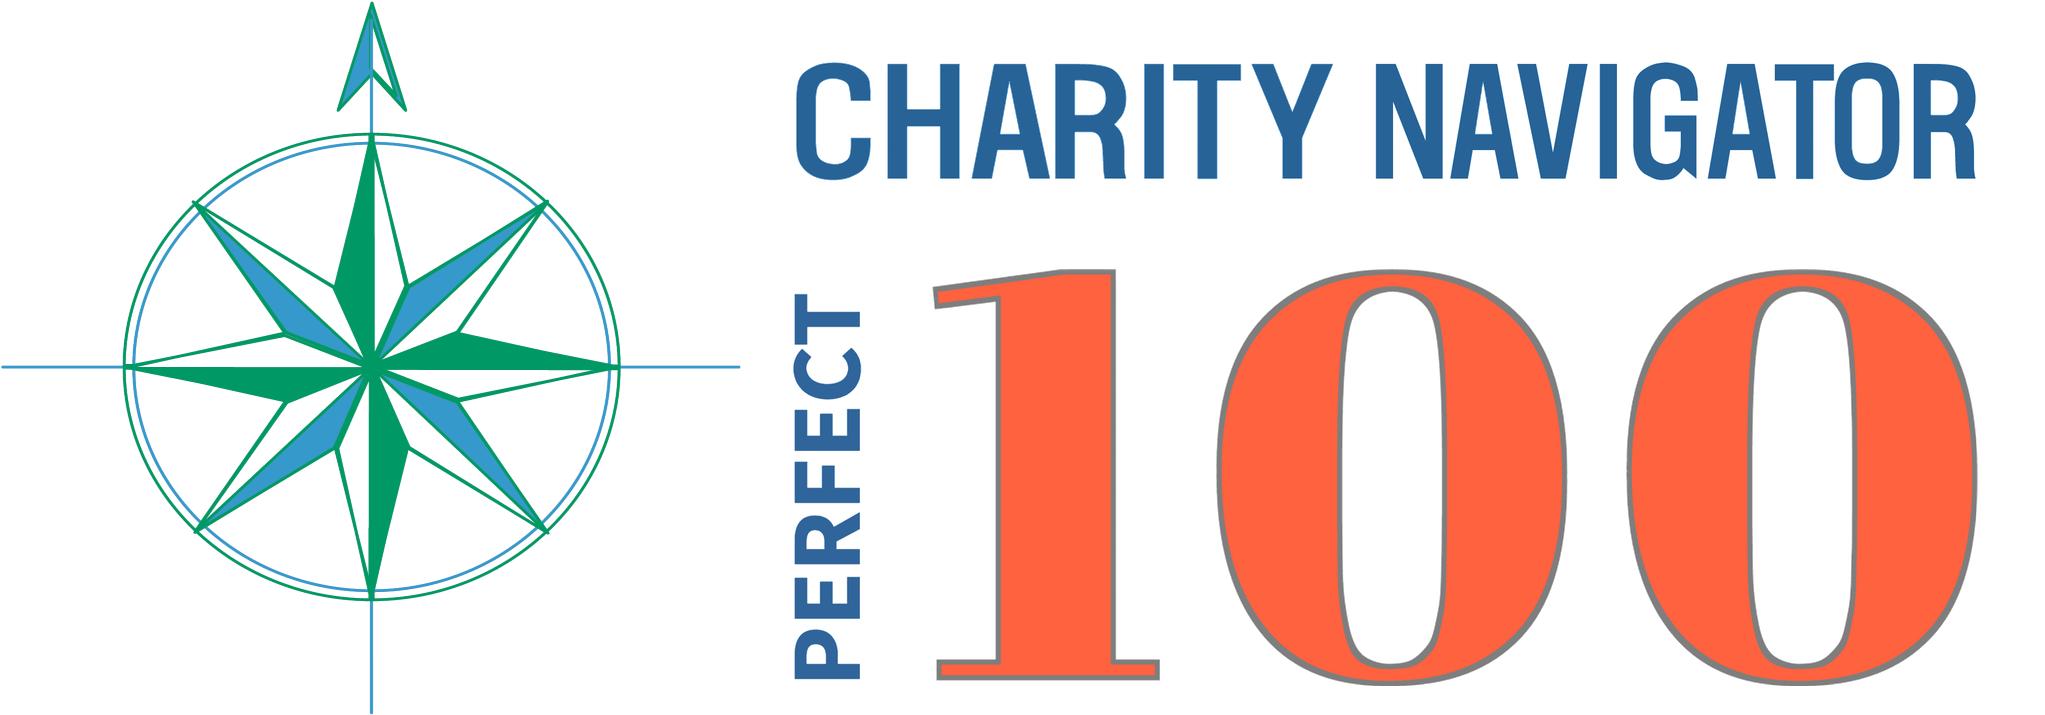 Charity Navigator Perfect 100